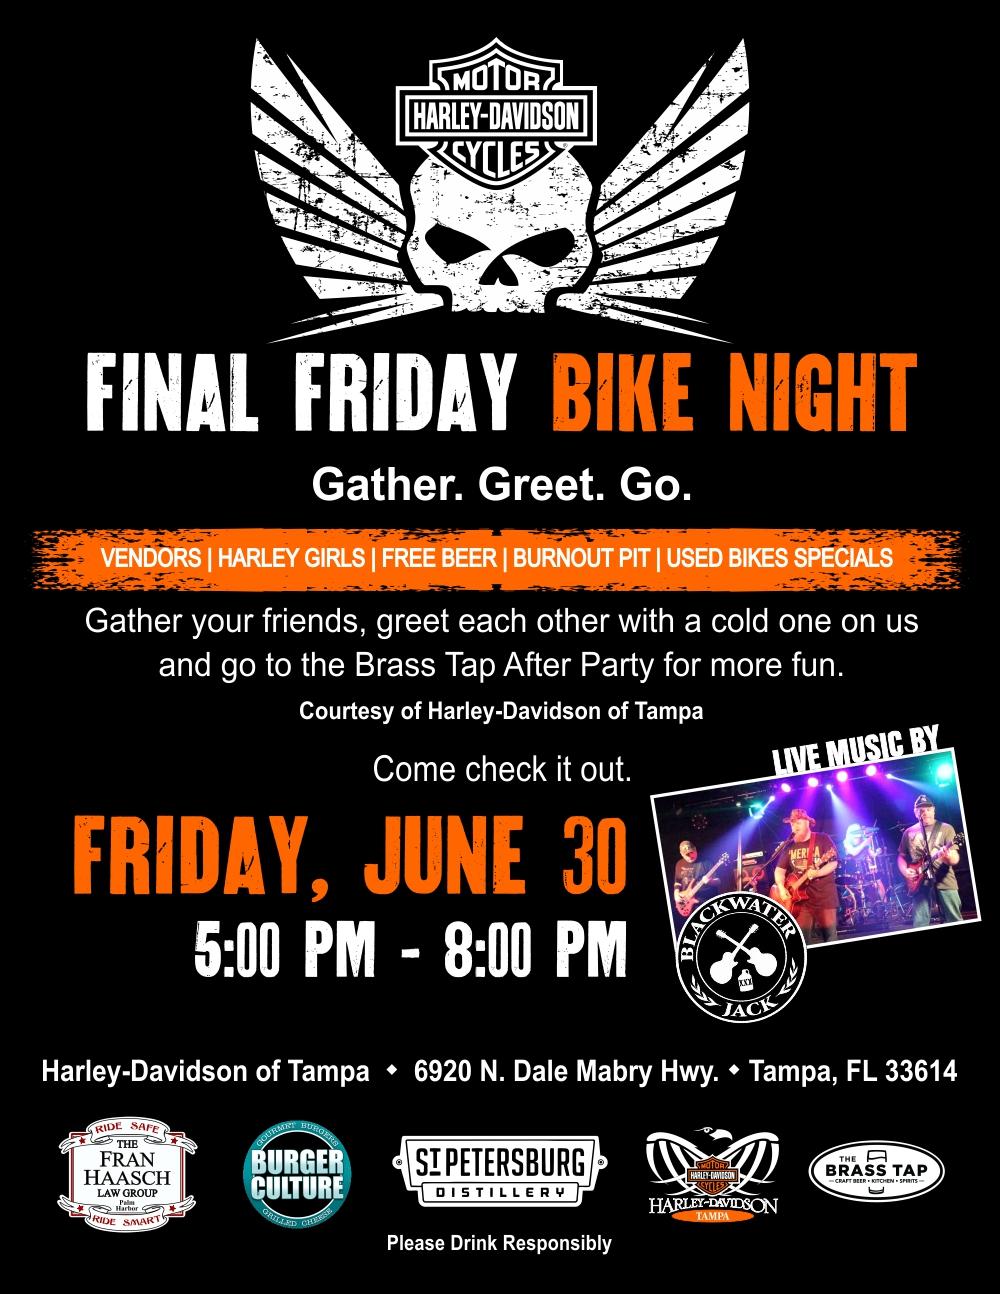 Final Friday Bike Night